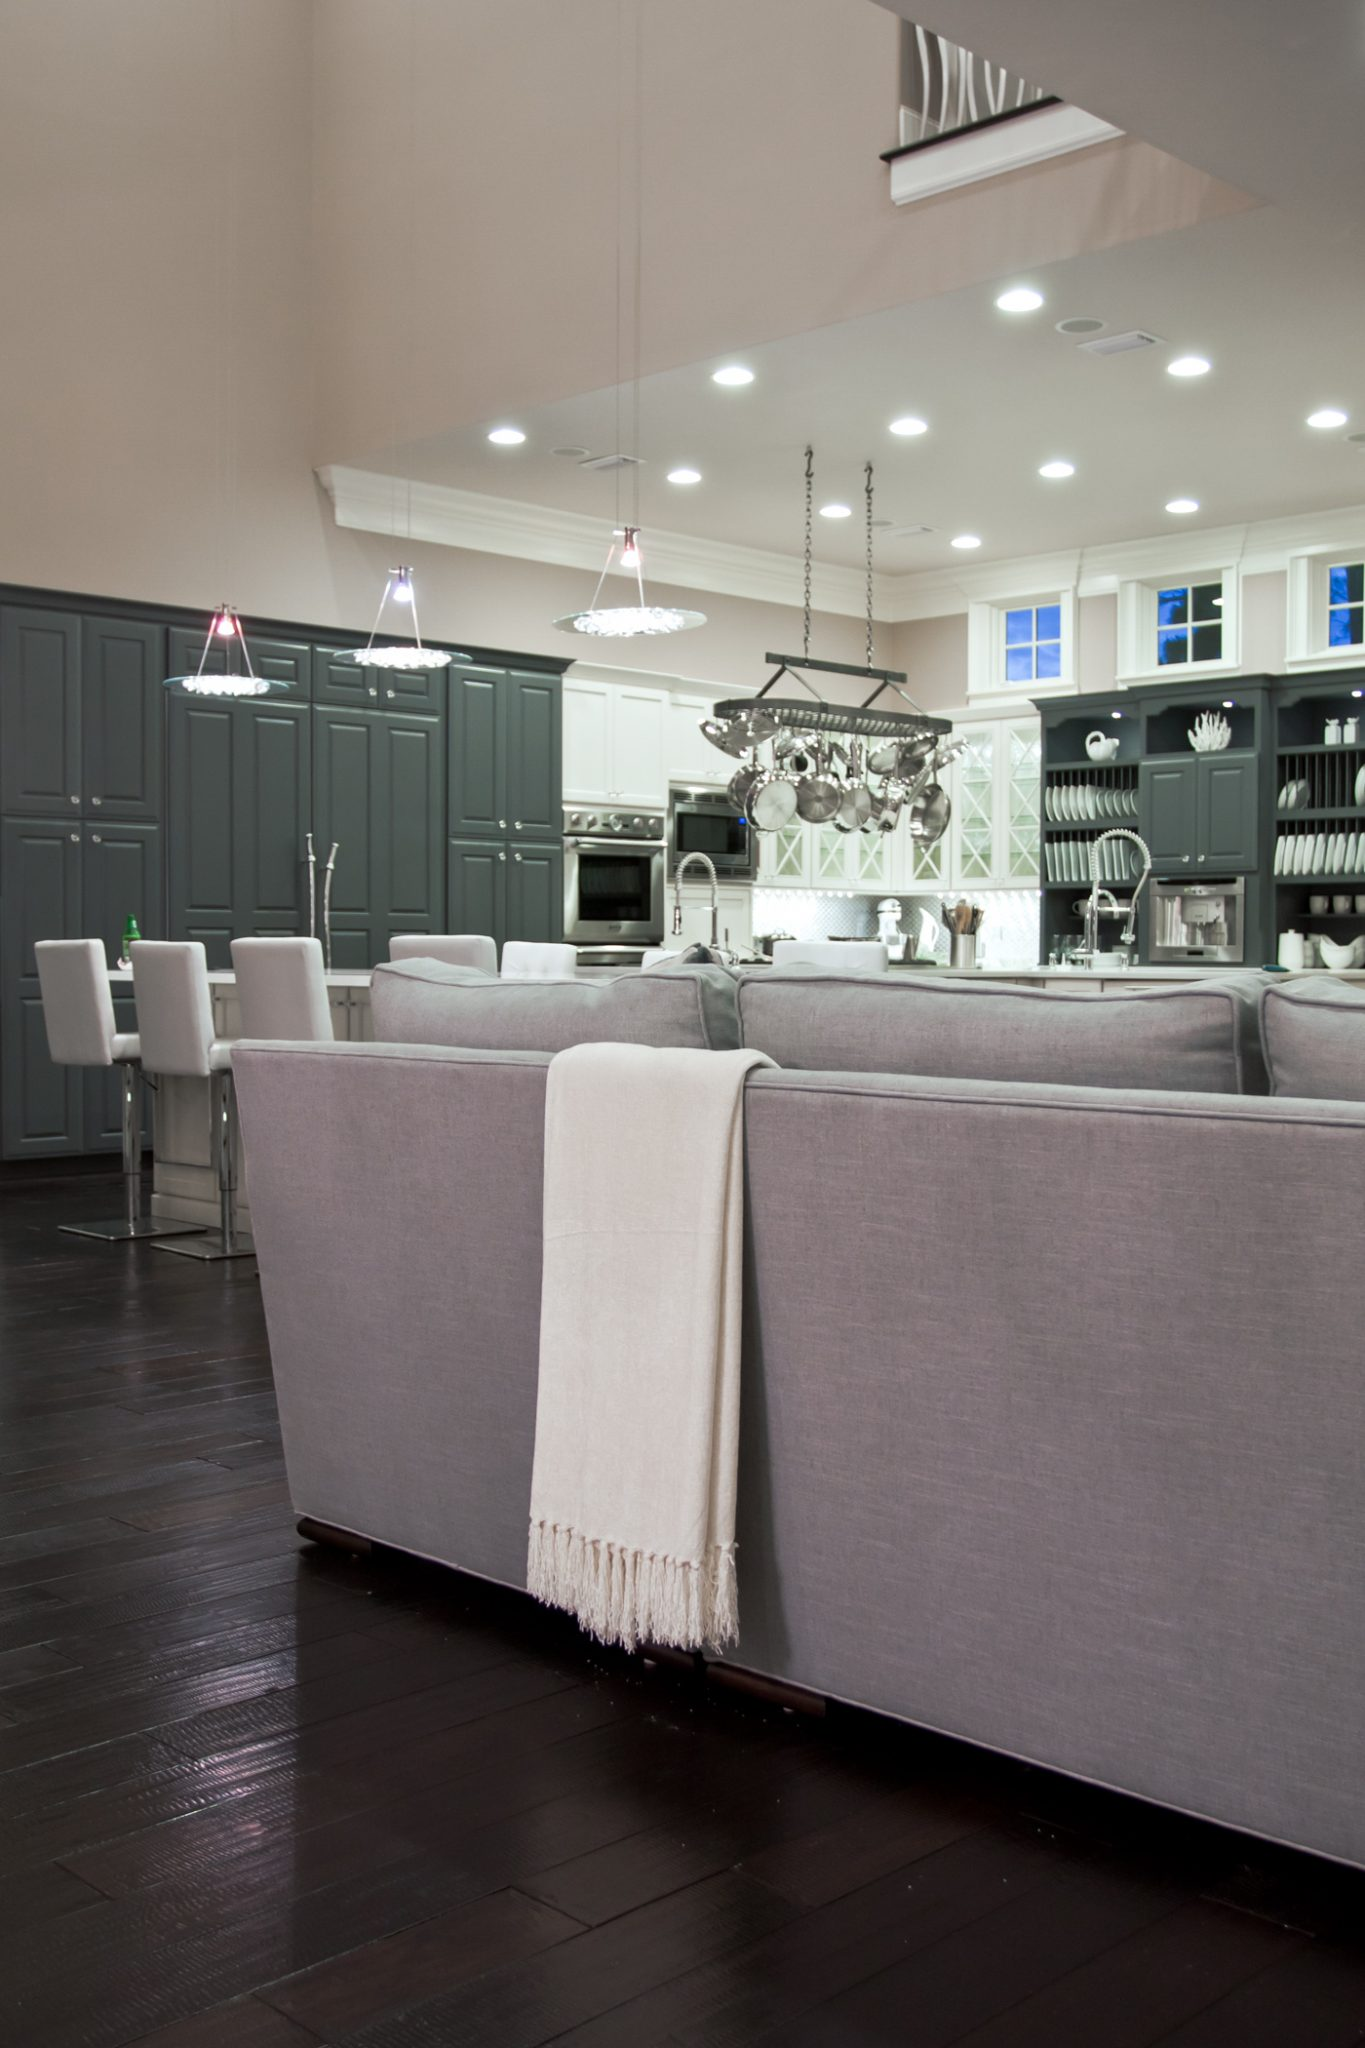 kitchens etc kitchen design on 30a 12 Kitchens Etc 30A